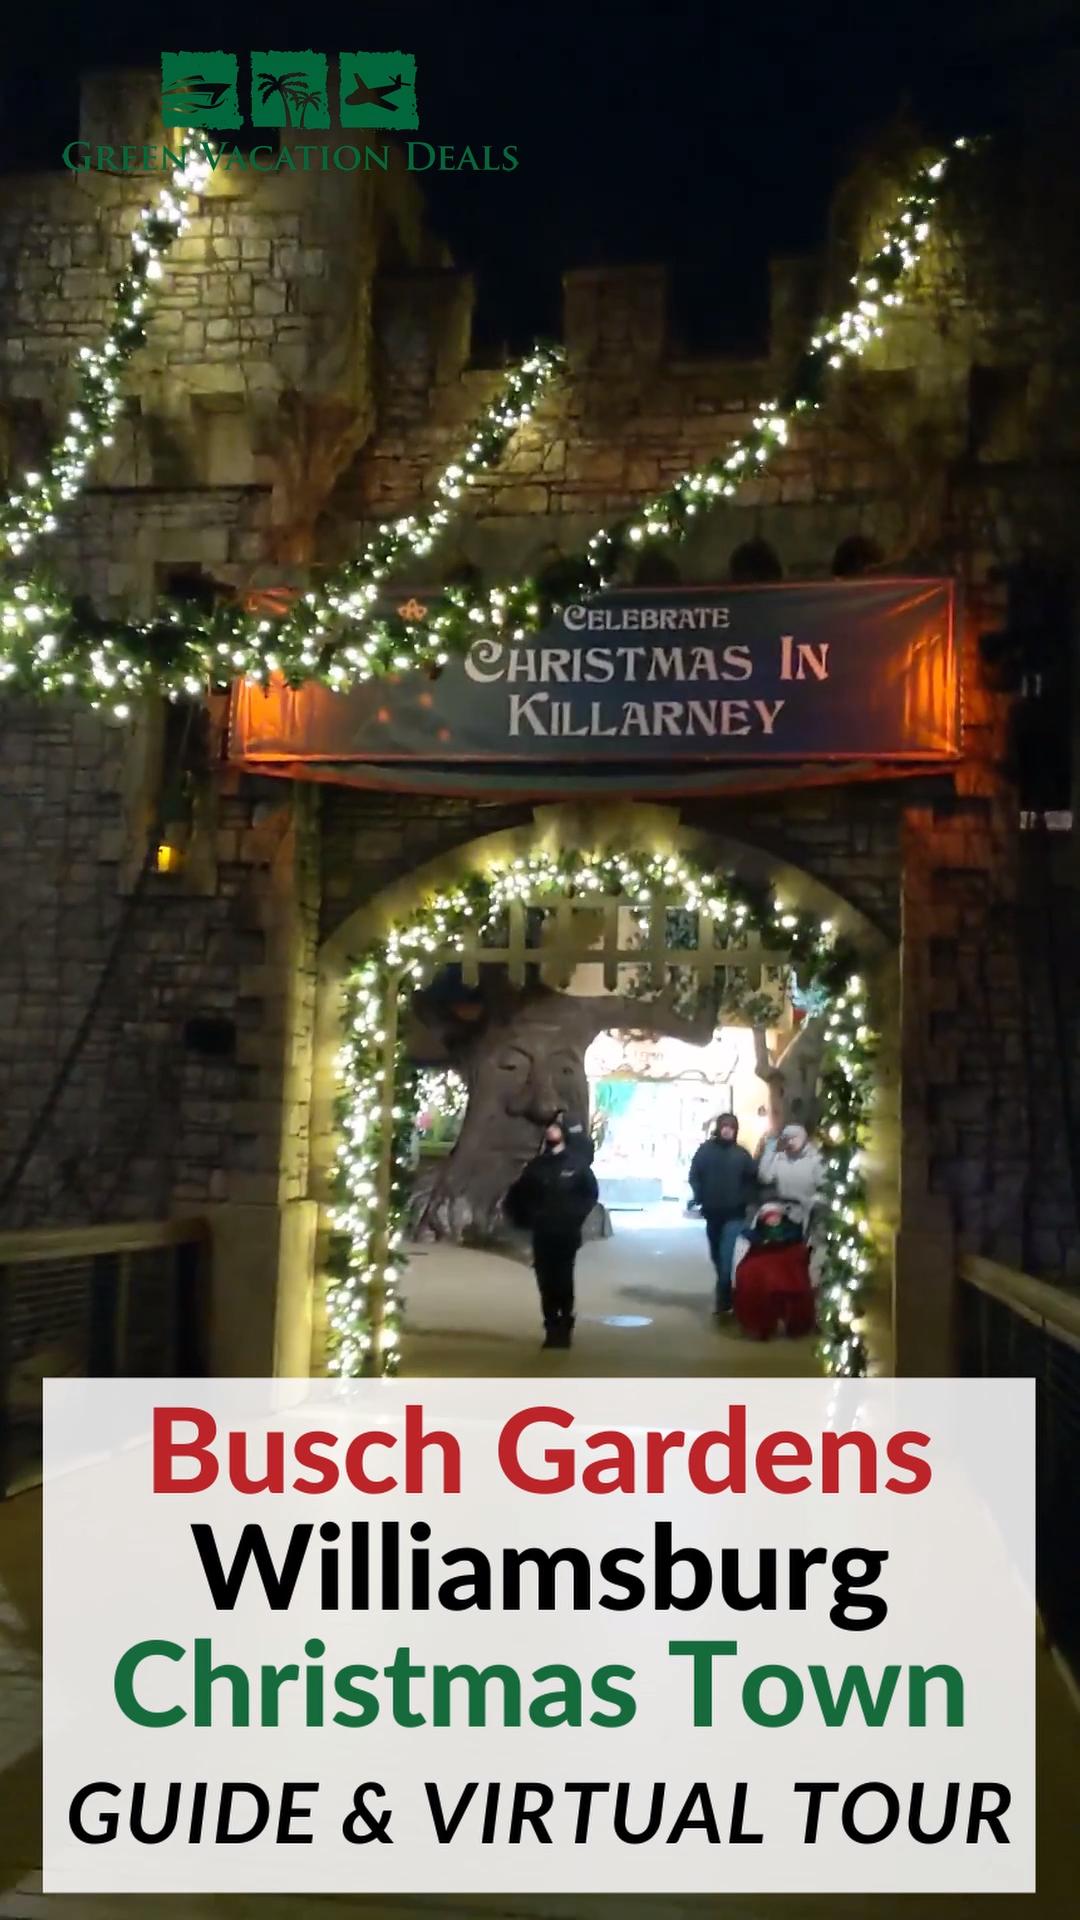 4199dbfc98f0b15af193633ce642ee73 - Busch Gardens Williamsburg Christmas Town Discount Tickets 2019